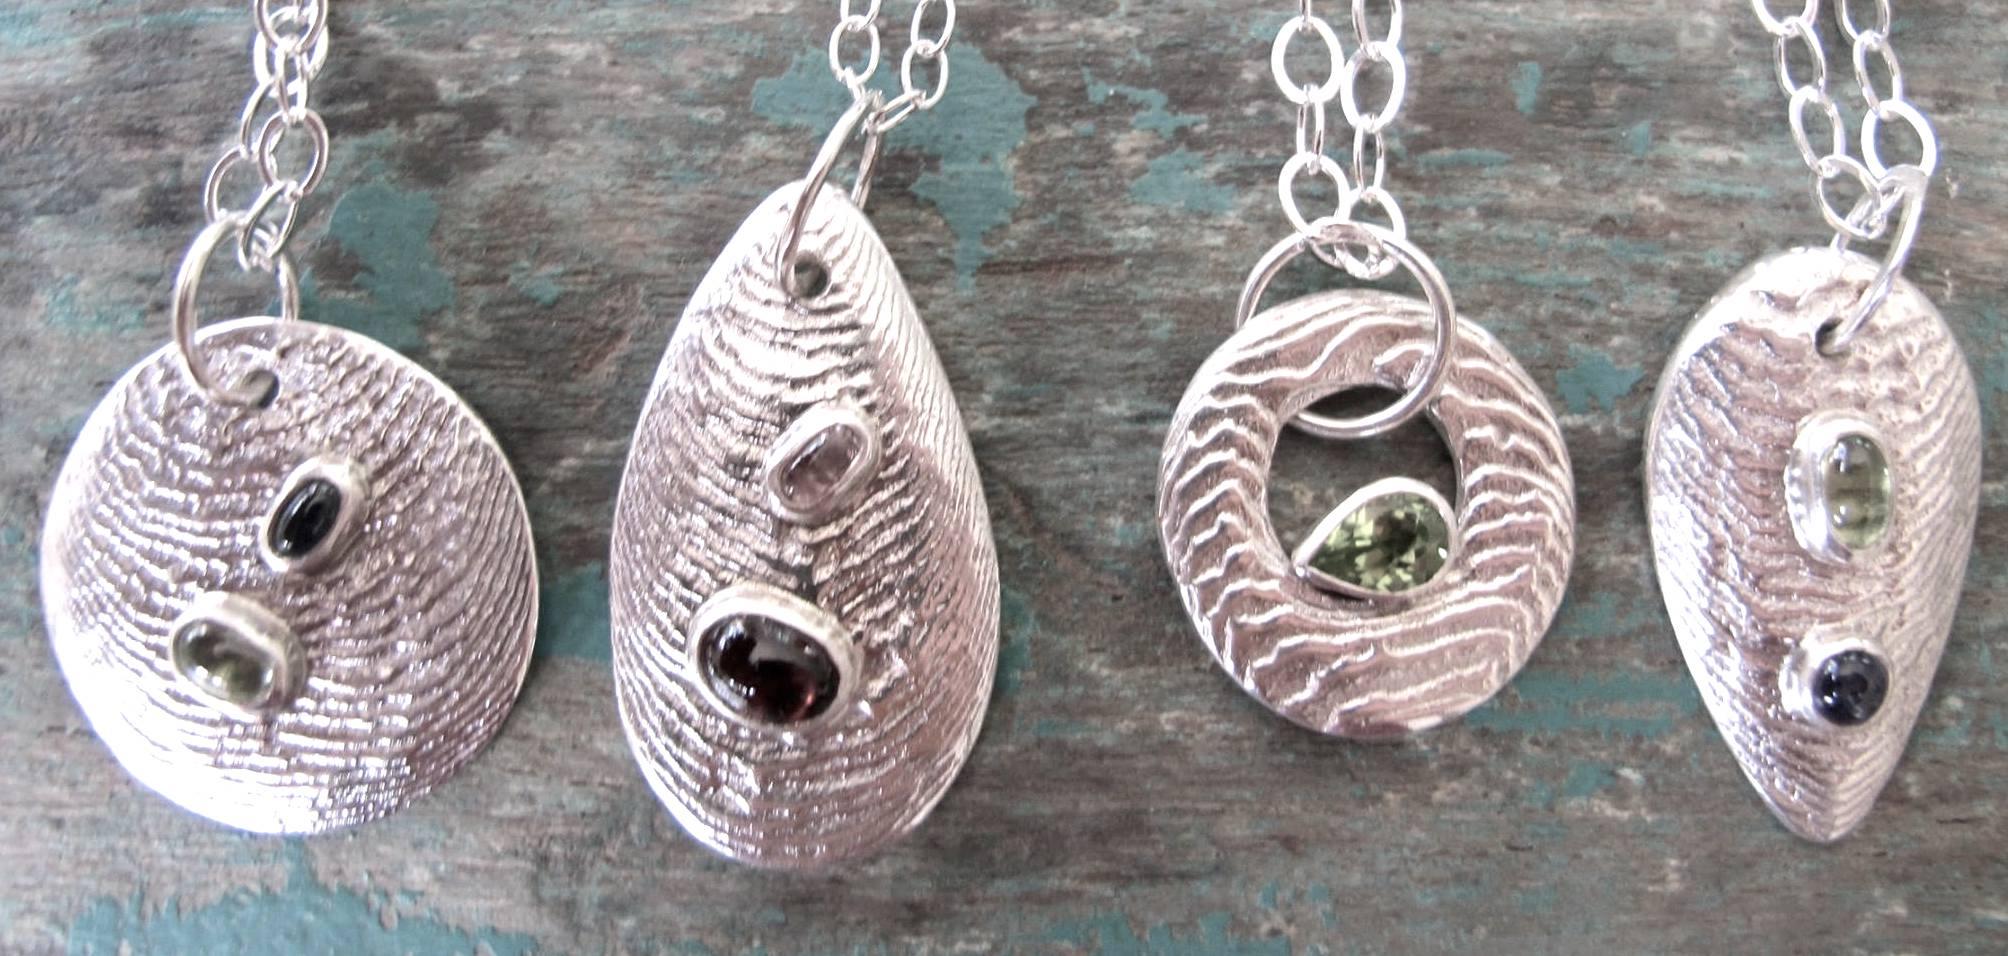 Kaila Fusco necklaces